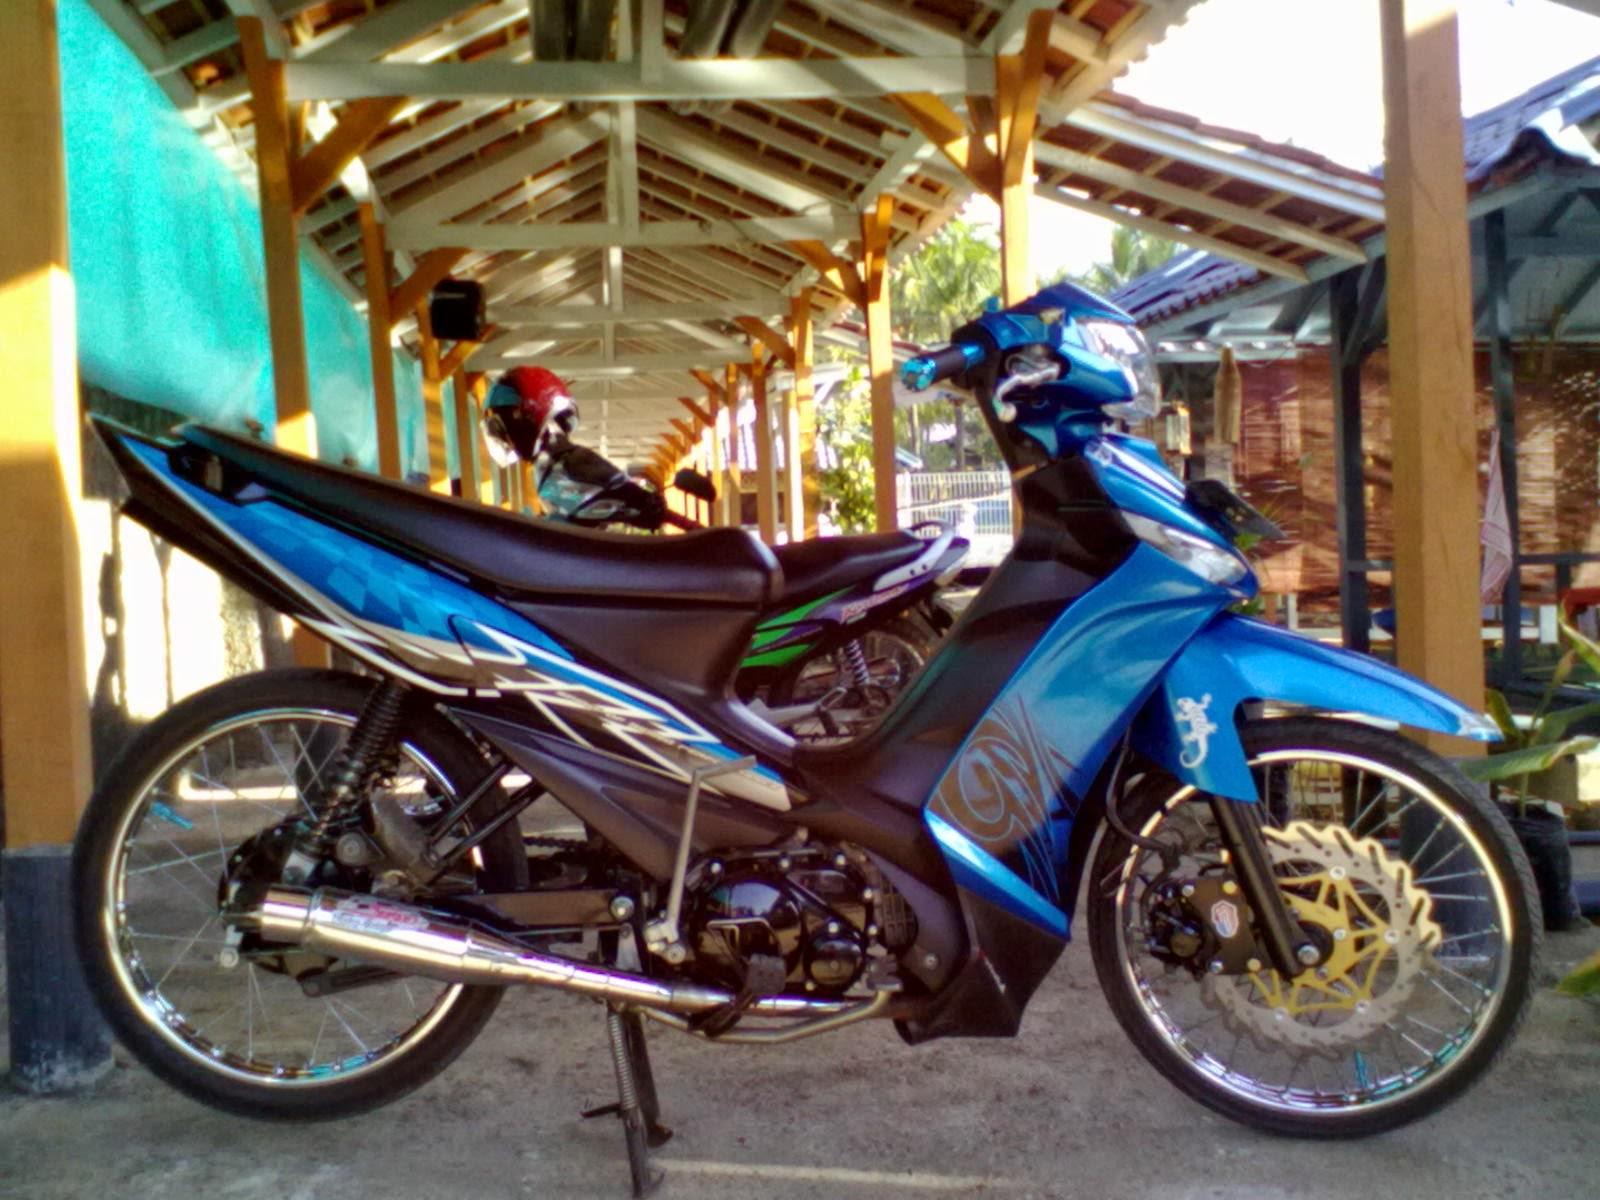 Modifikasi Motor Vega ZR 2011 Terbaru 2016 Sukaon